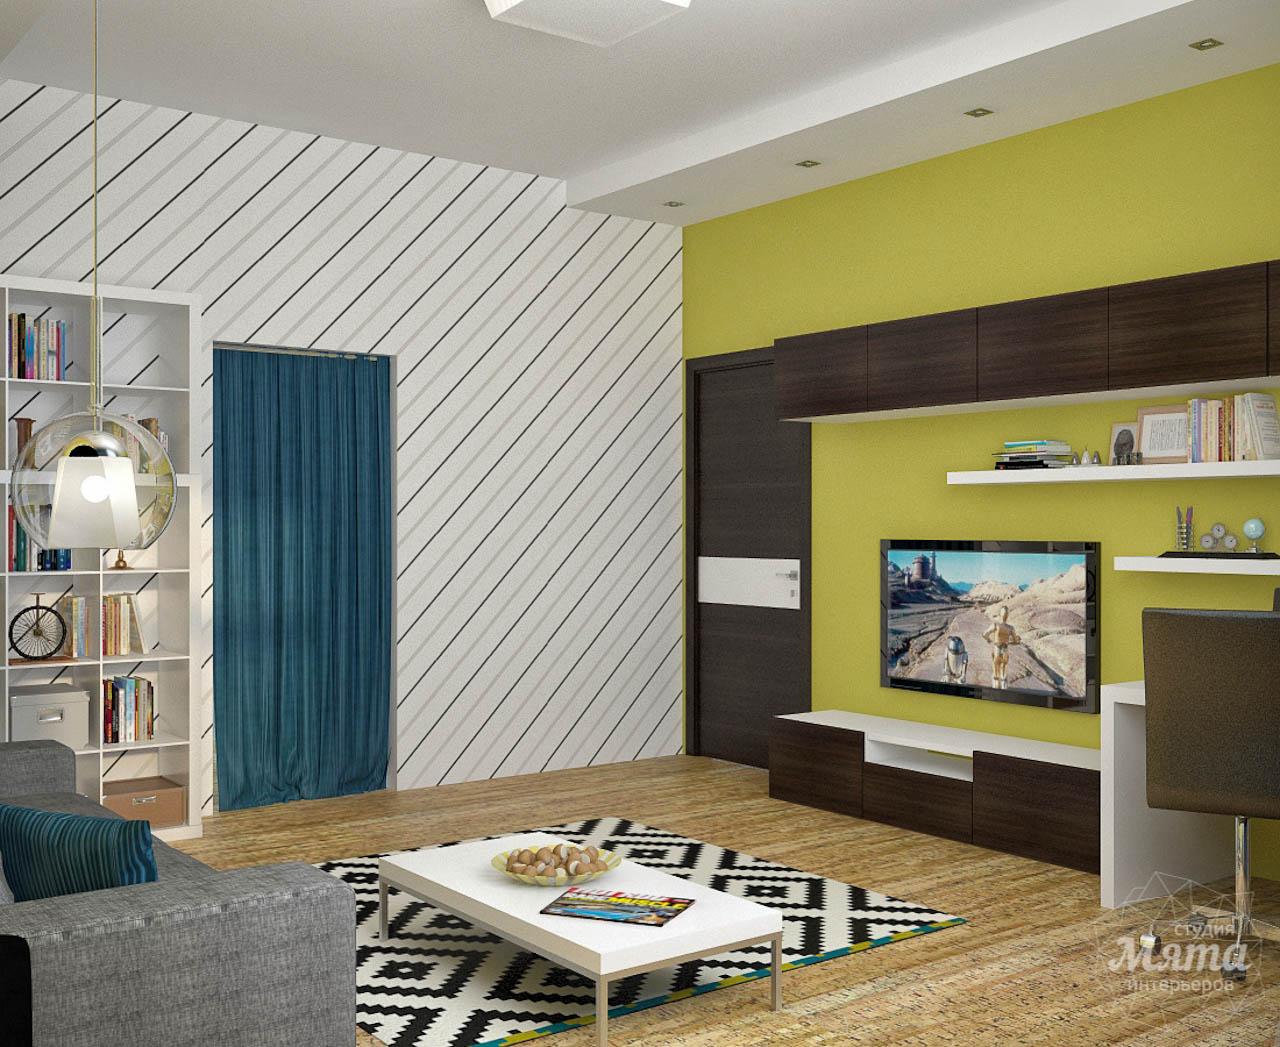 Дизайн проект интерьера коттеджа  в стиле минимализм по ул. Барвинка 15 img1072605804